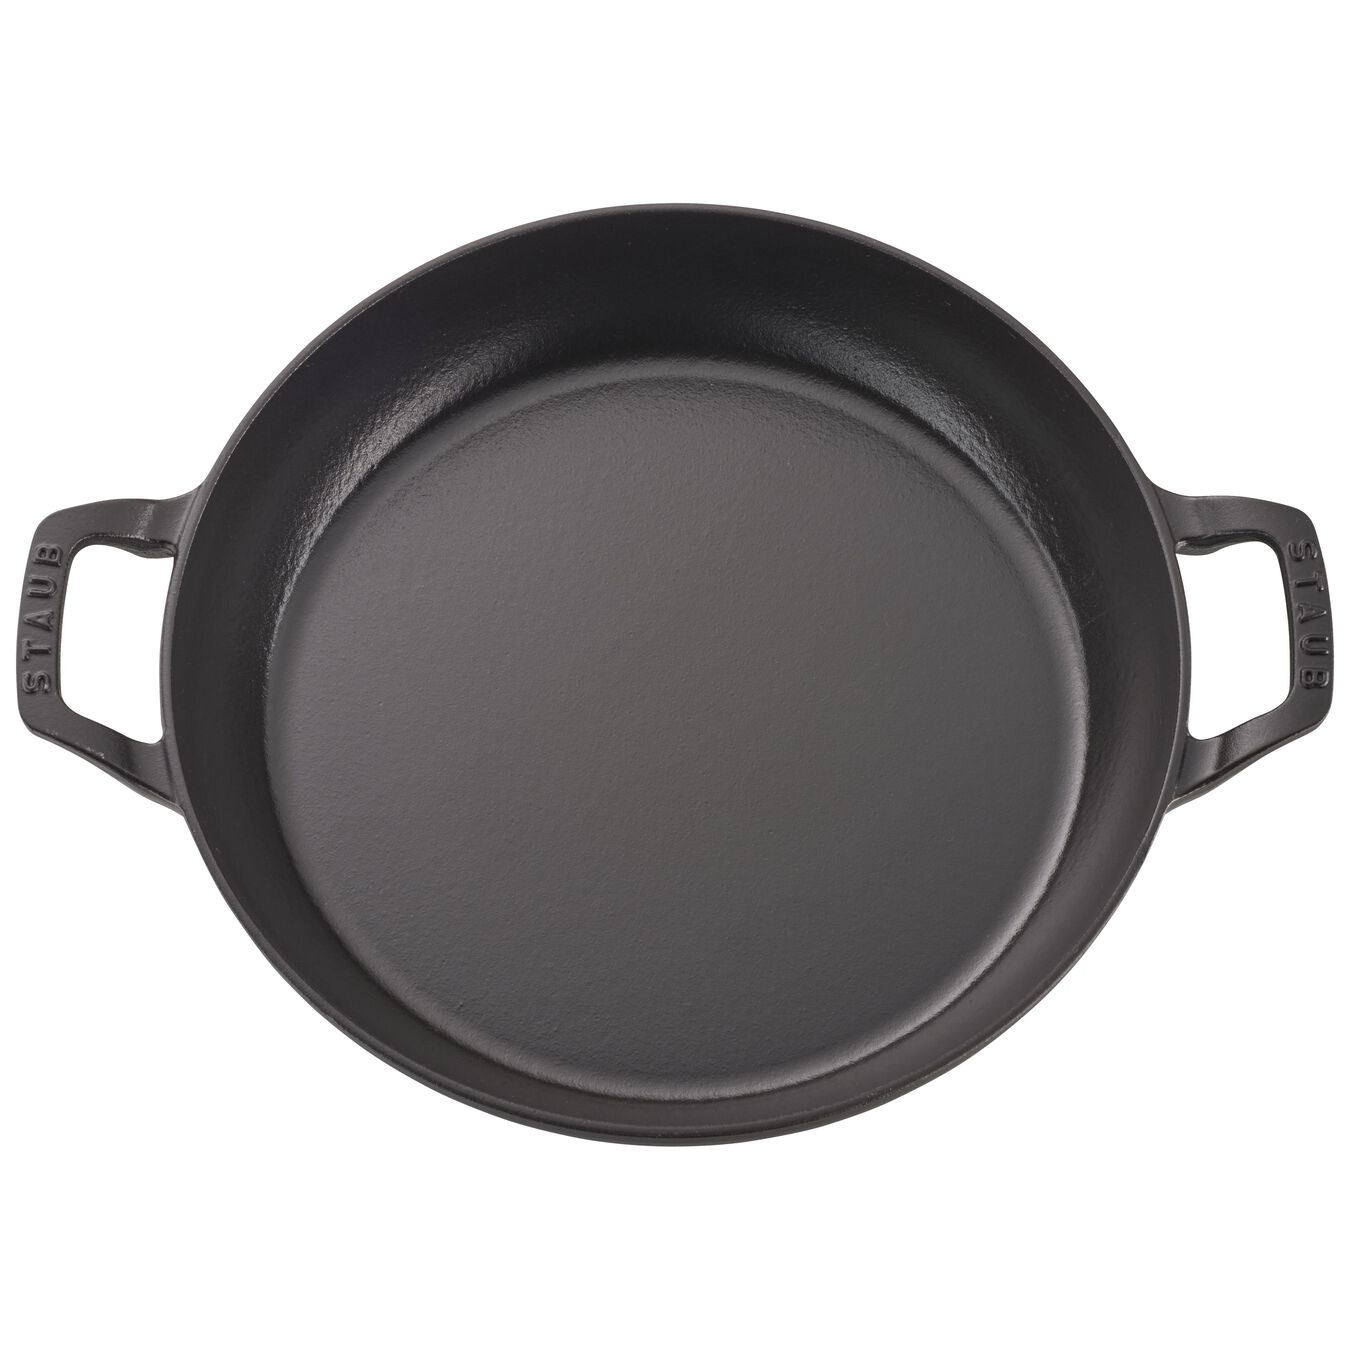 3.5-qt Braiser - Graphite Grey,,large 4